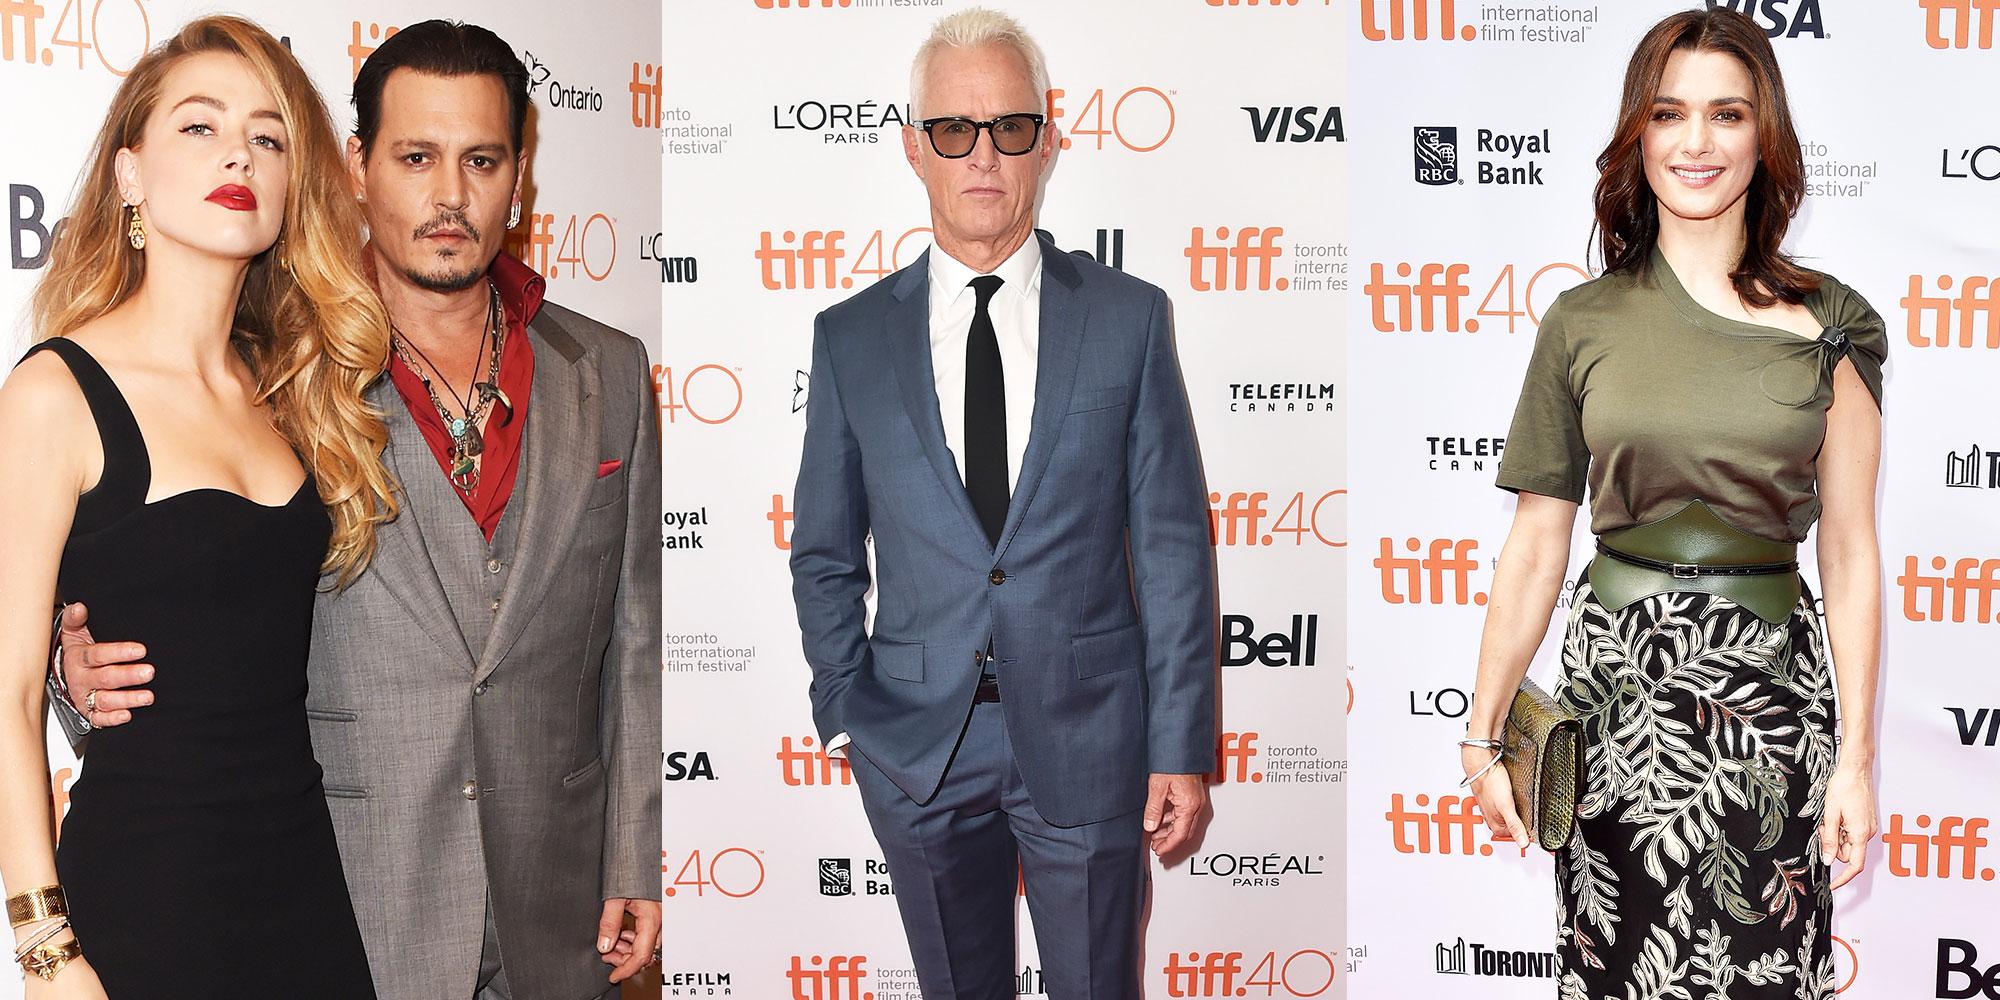 Stars at TIFF - Toronto Film Festival 2015 Red Carpet